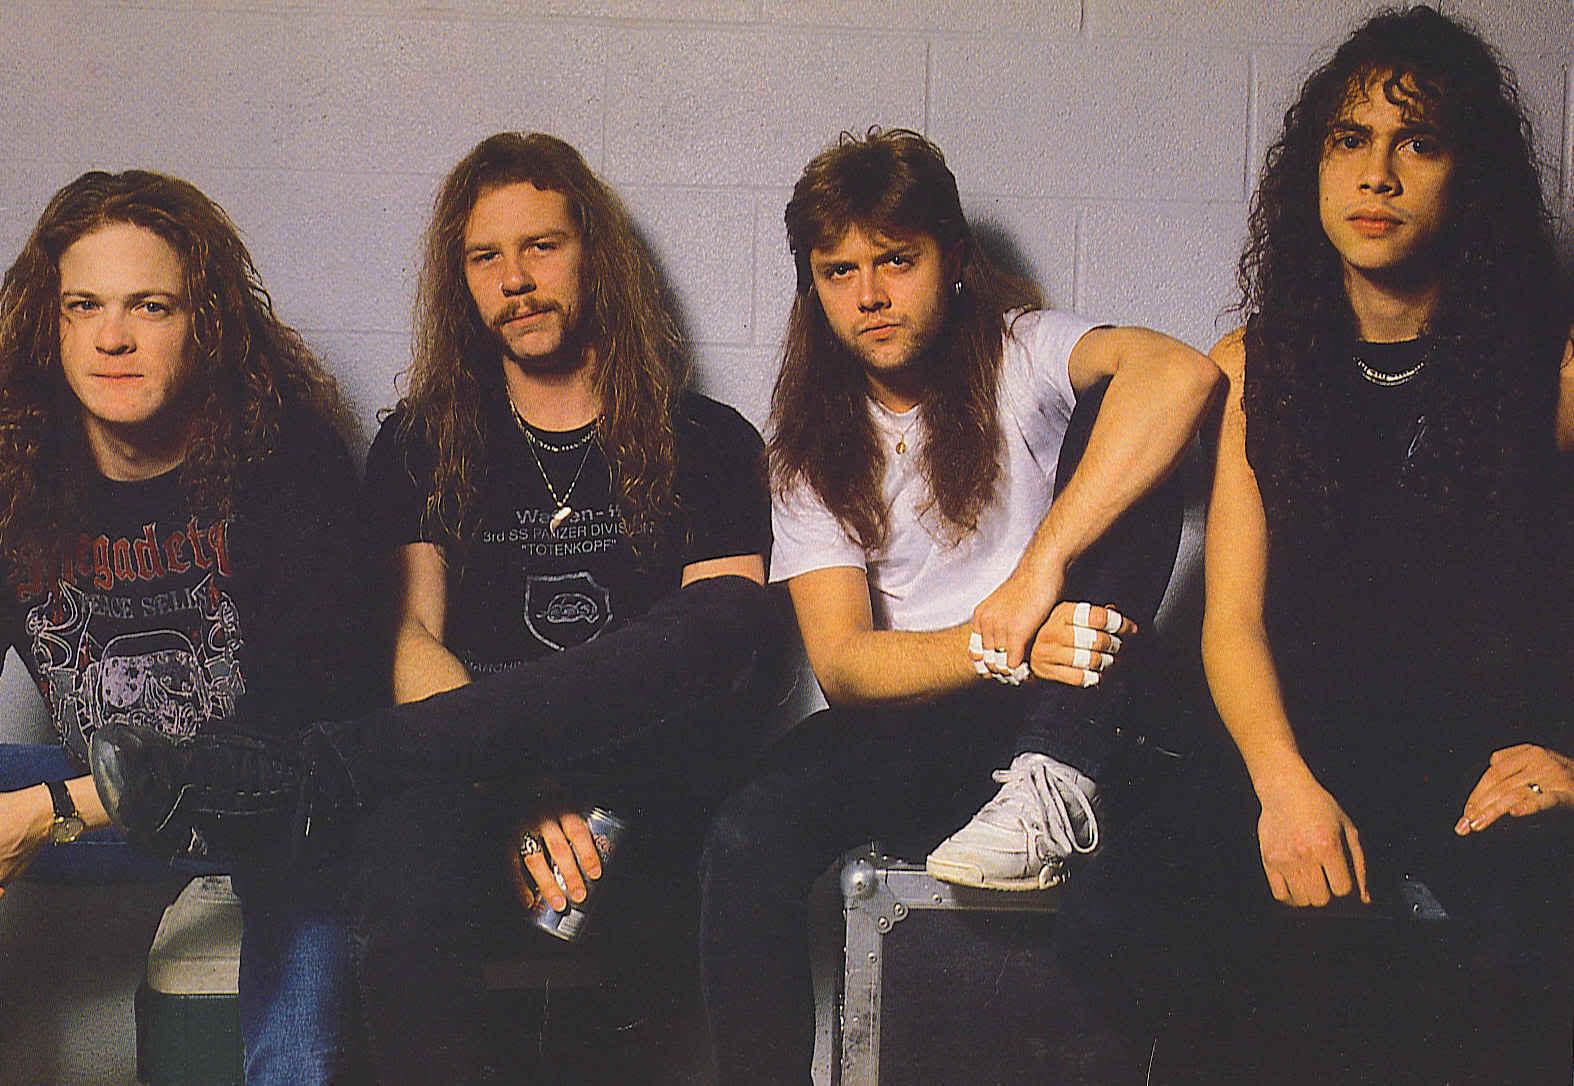 ESPN releases new SportsCenter video with Metallica - Blast